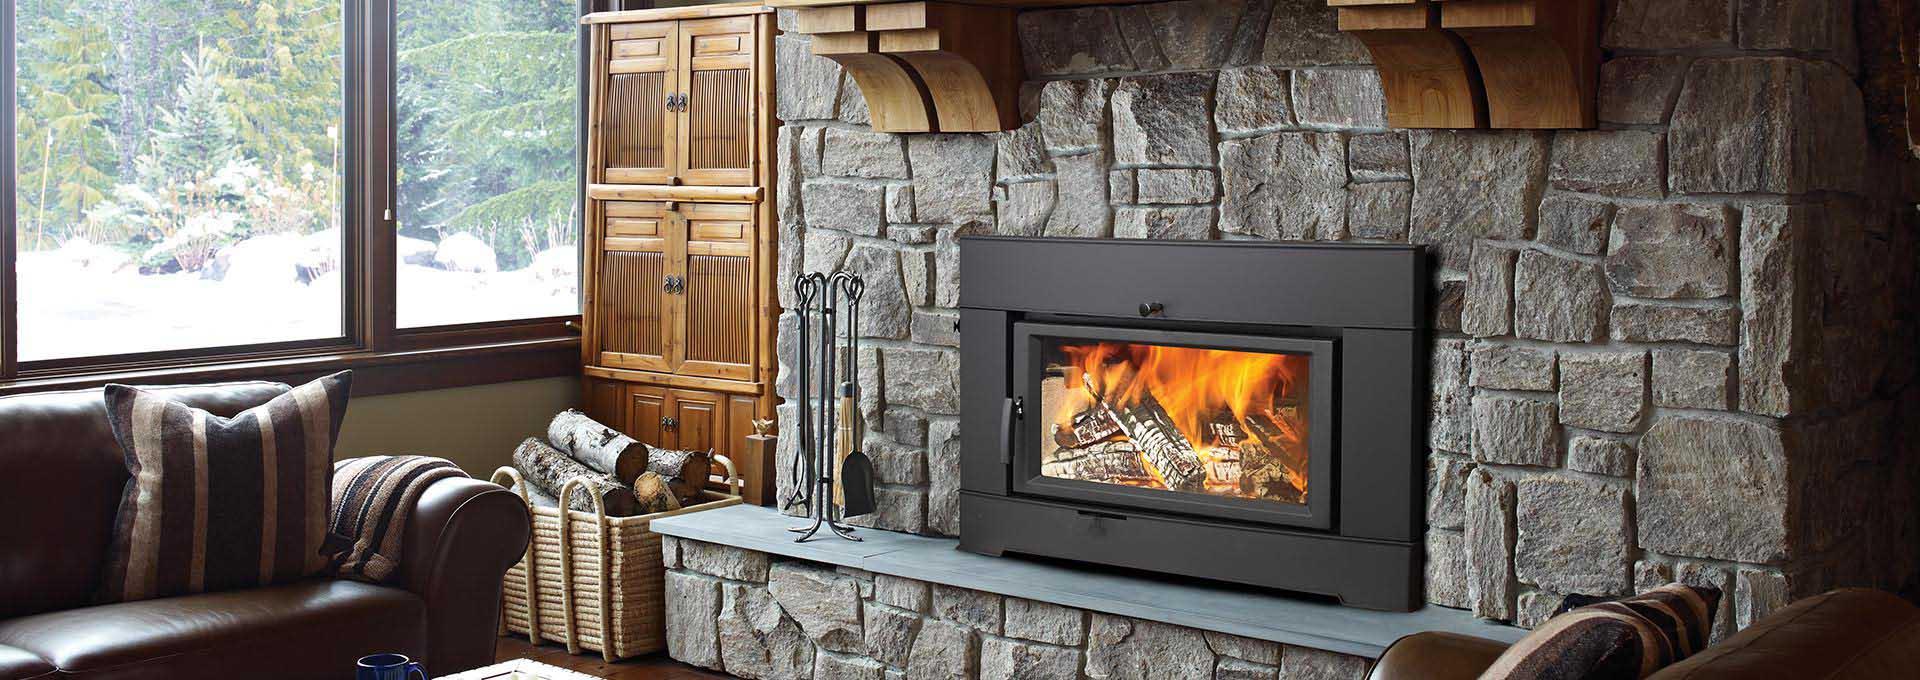 Fireplace Inserts Spokane Part - 43: An Efficient Upgrade